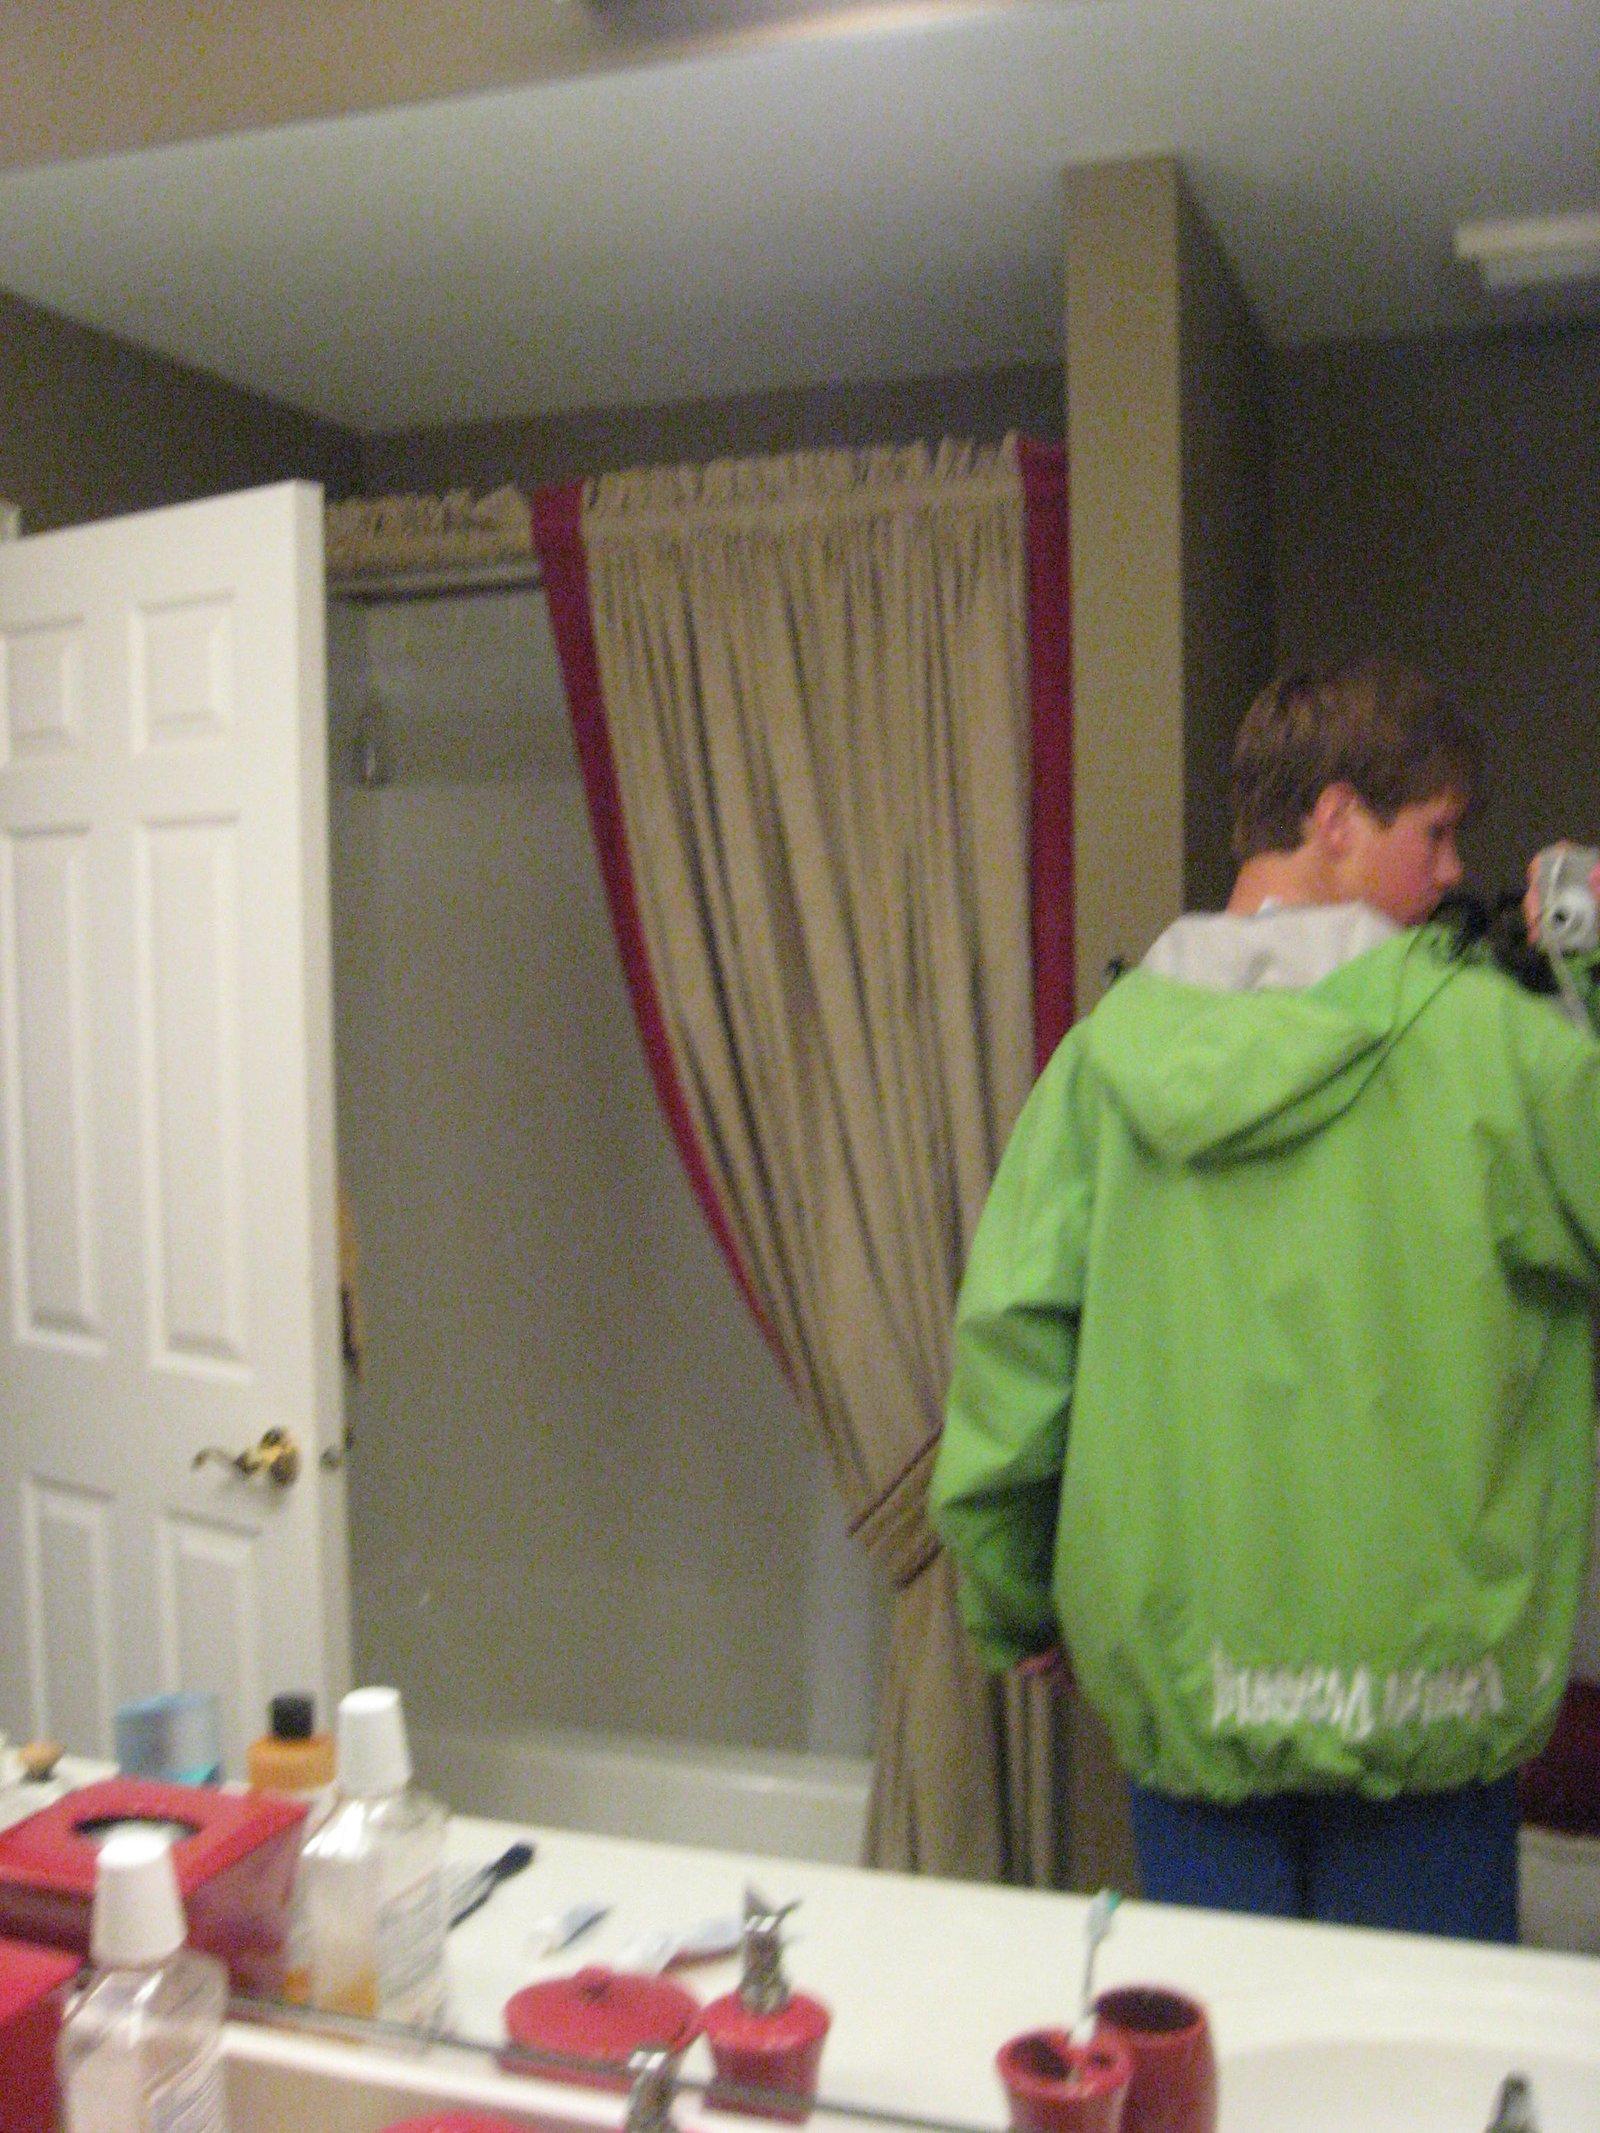 Ldc jacket (back)